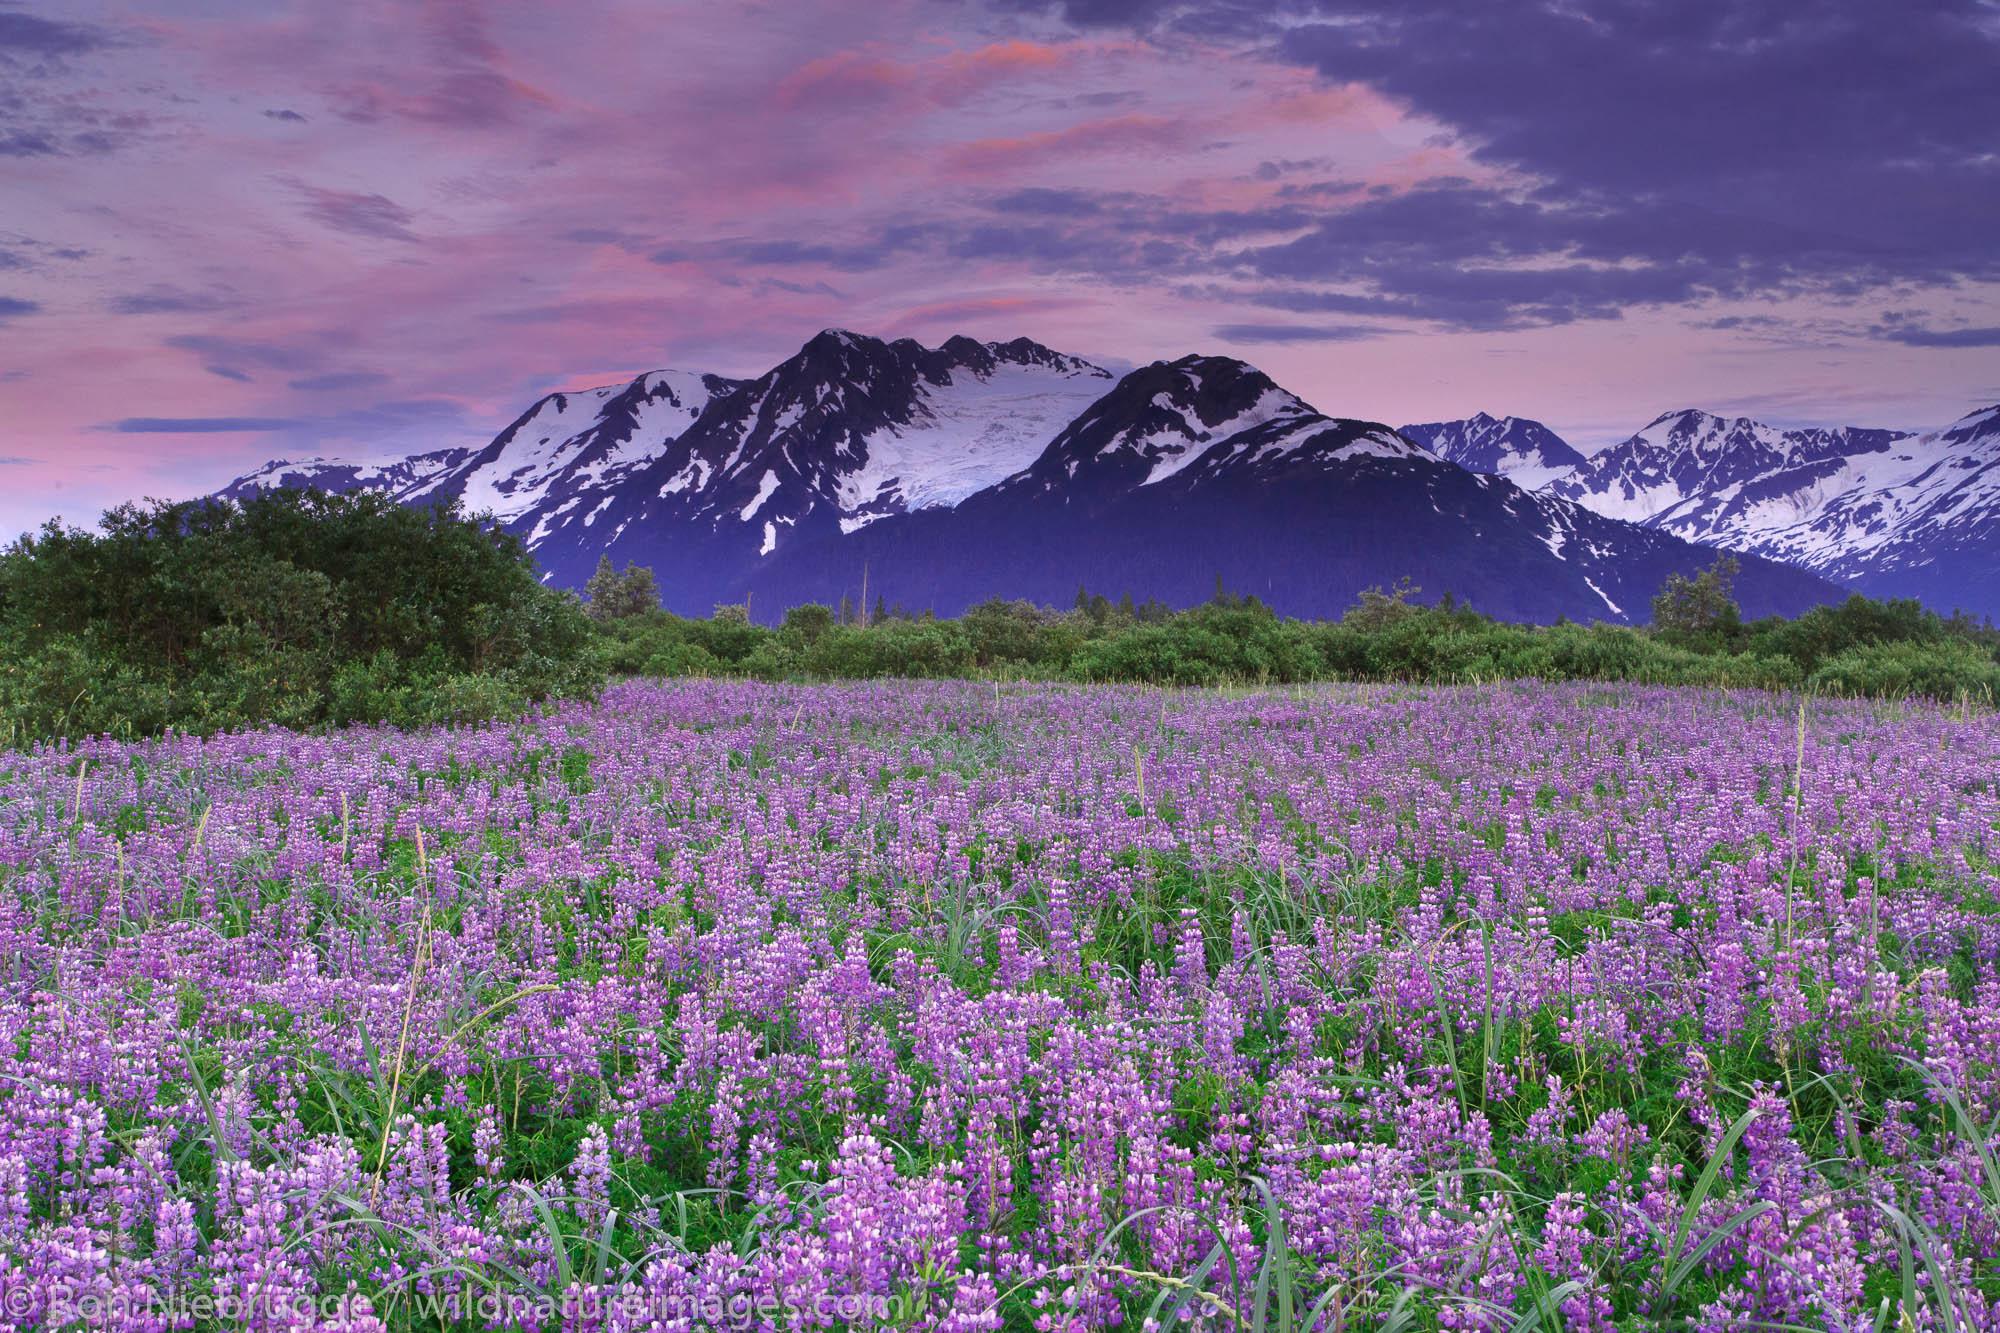 Chugach National Forest, Alaska Chugach, photo